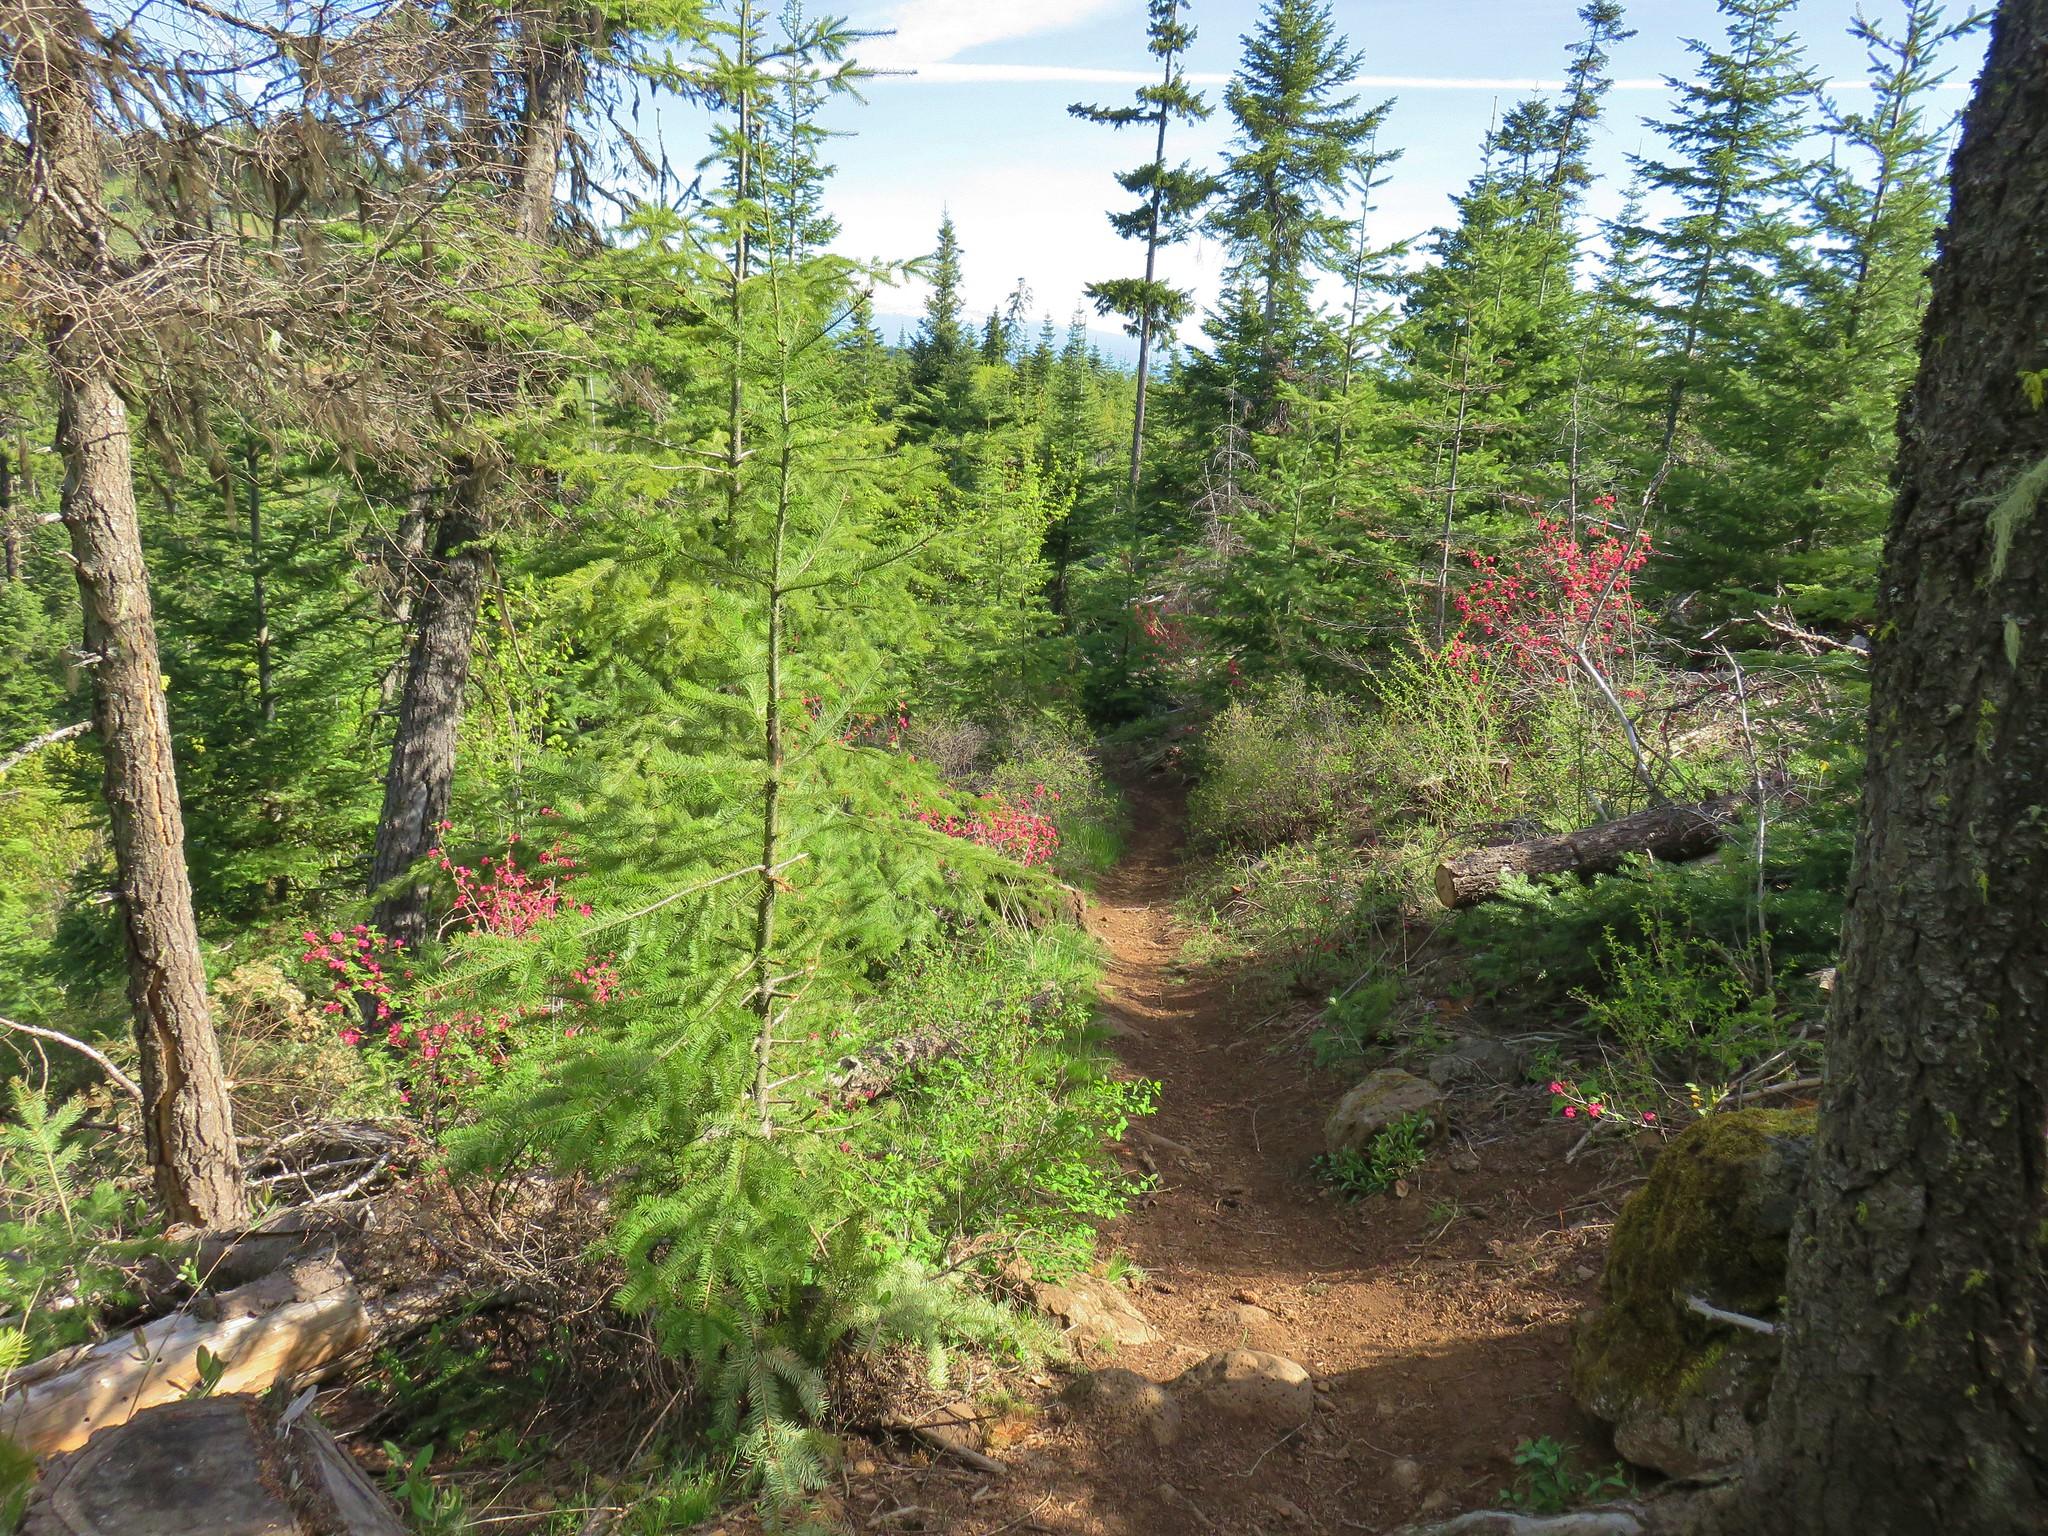 Surveyor's Ridge Trail